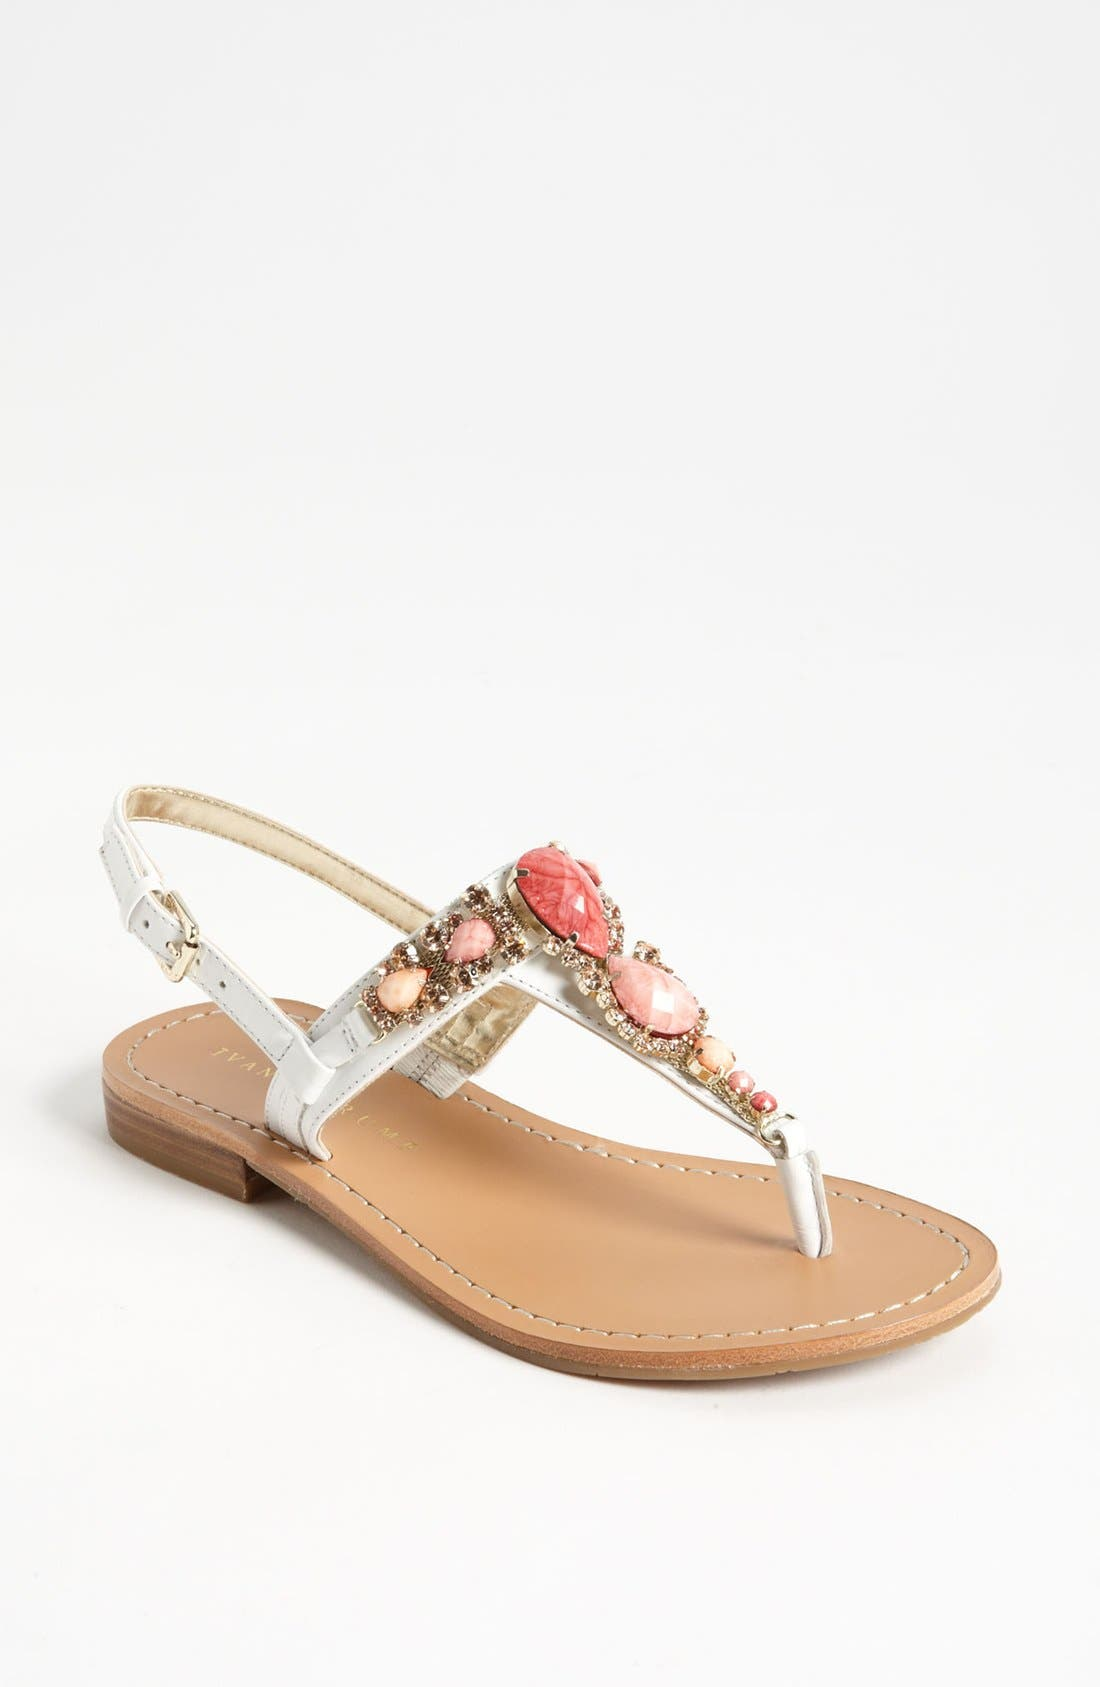 Alternate Image 1 Selected - Ivanka Trump 'Pansy' Sandal